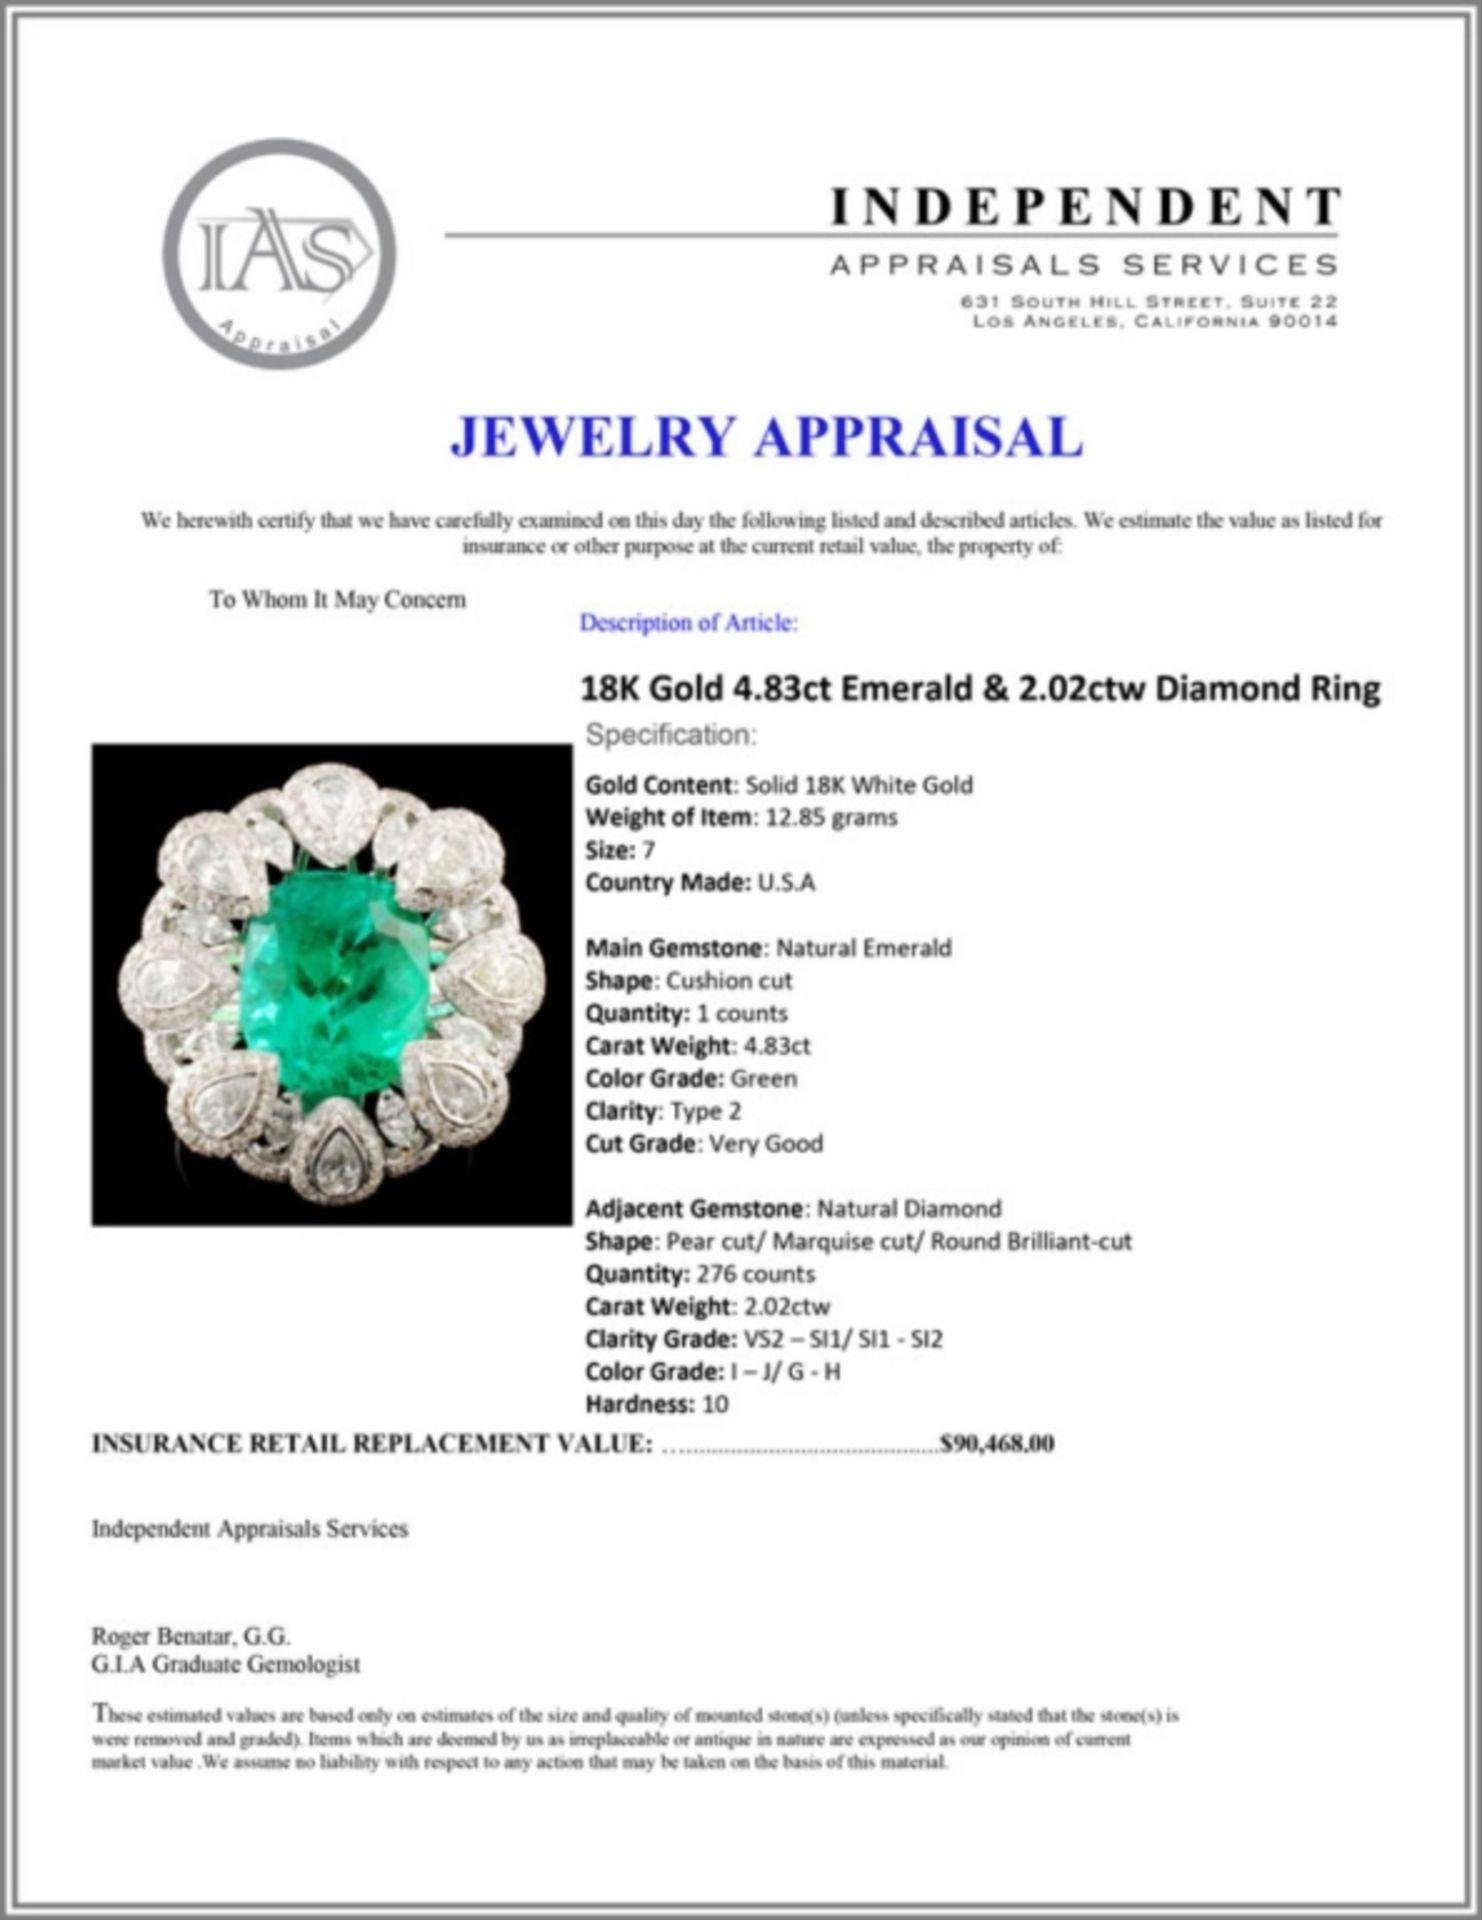 18K Gold 4.83ct Emerald & 2.02ctw Diamond Ring - Image 5 of 5